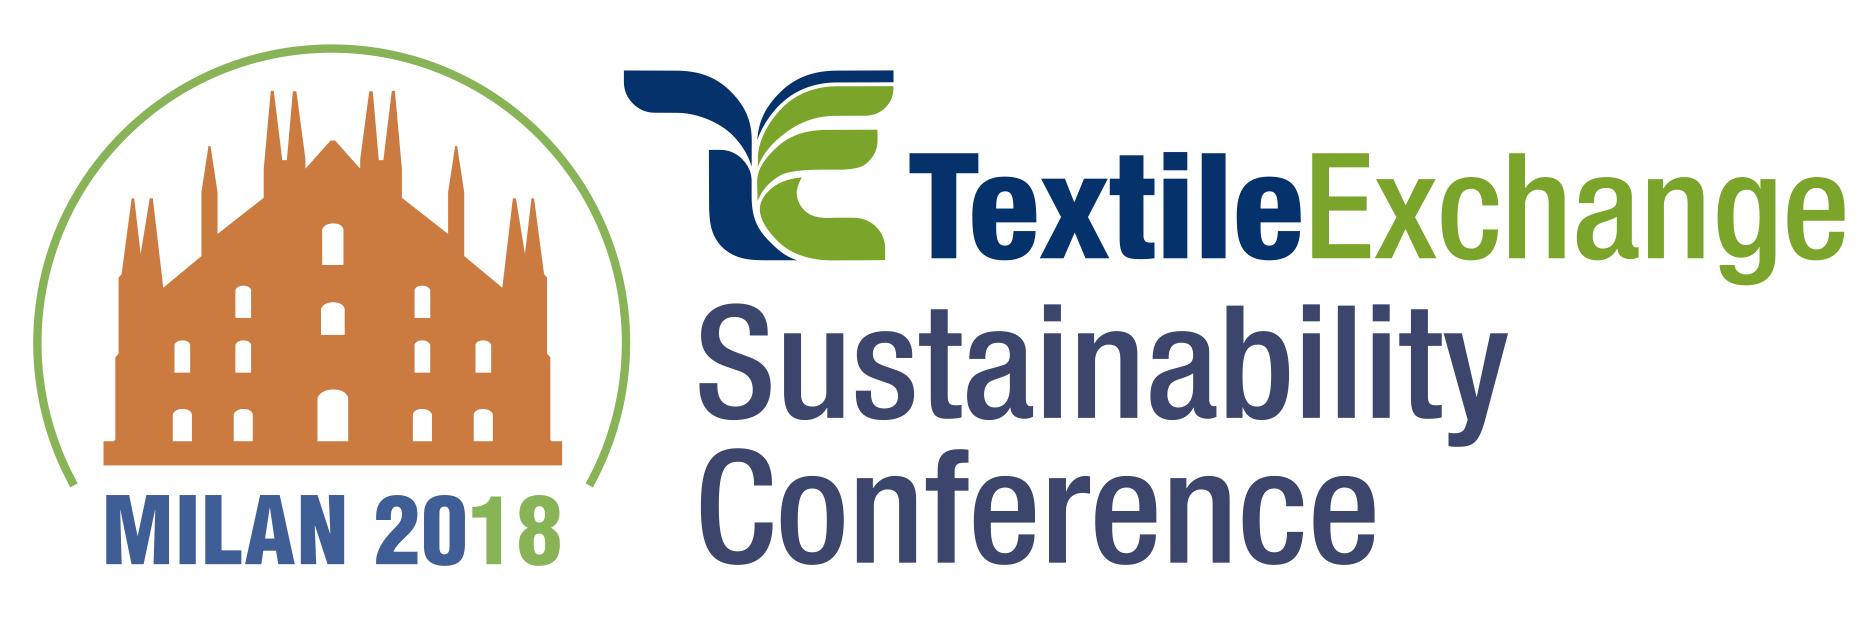 Egedeniz Textile – Textile Sustainability Conference 2018 – Milan